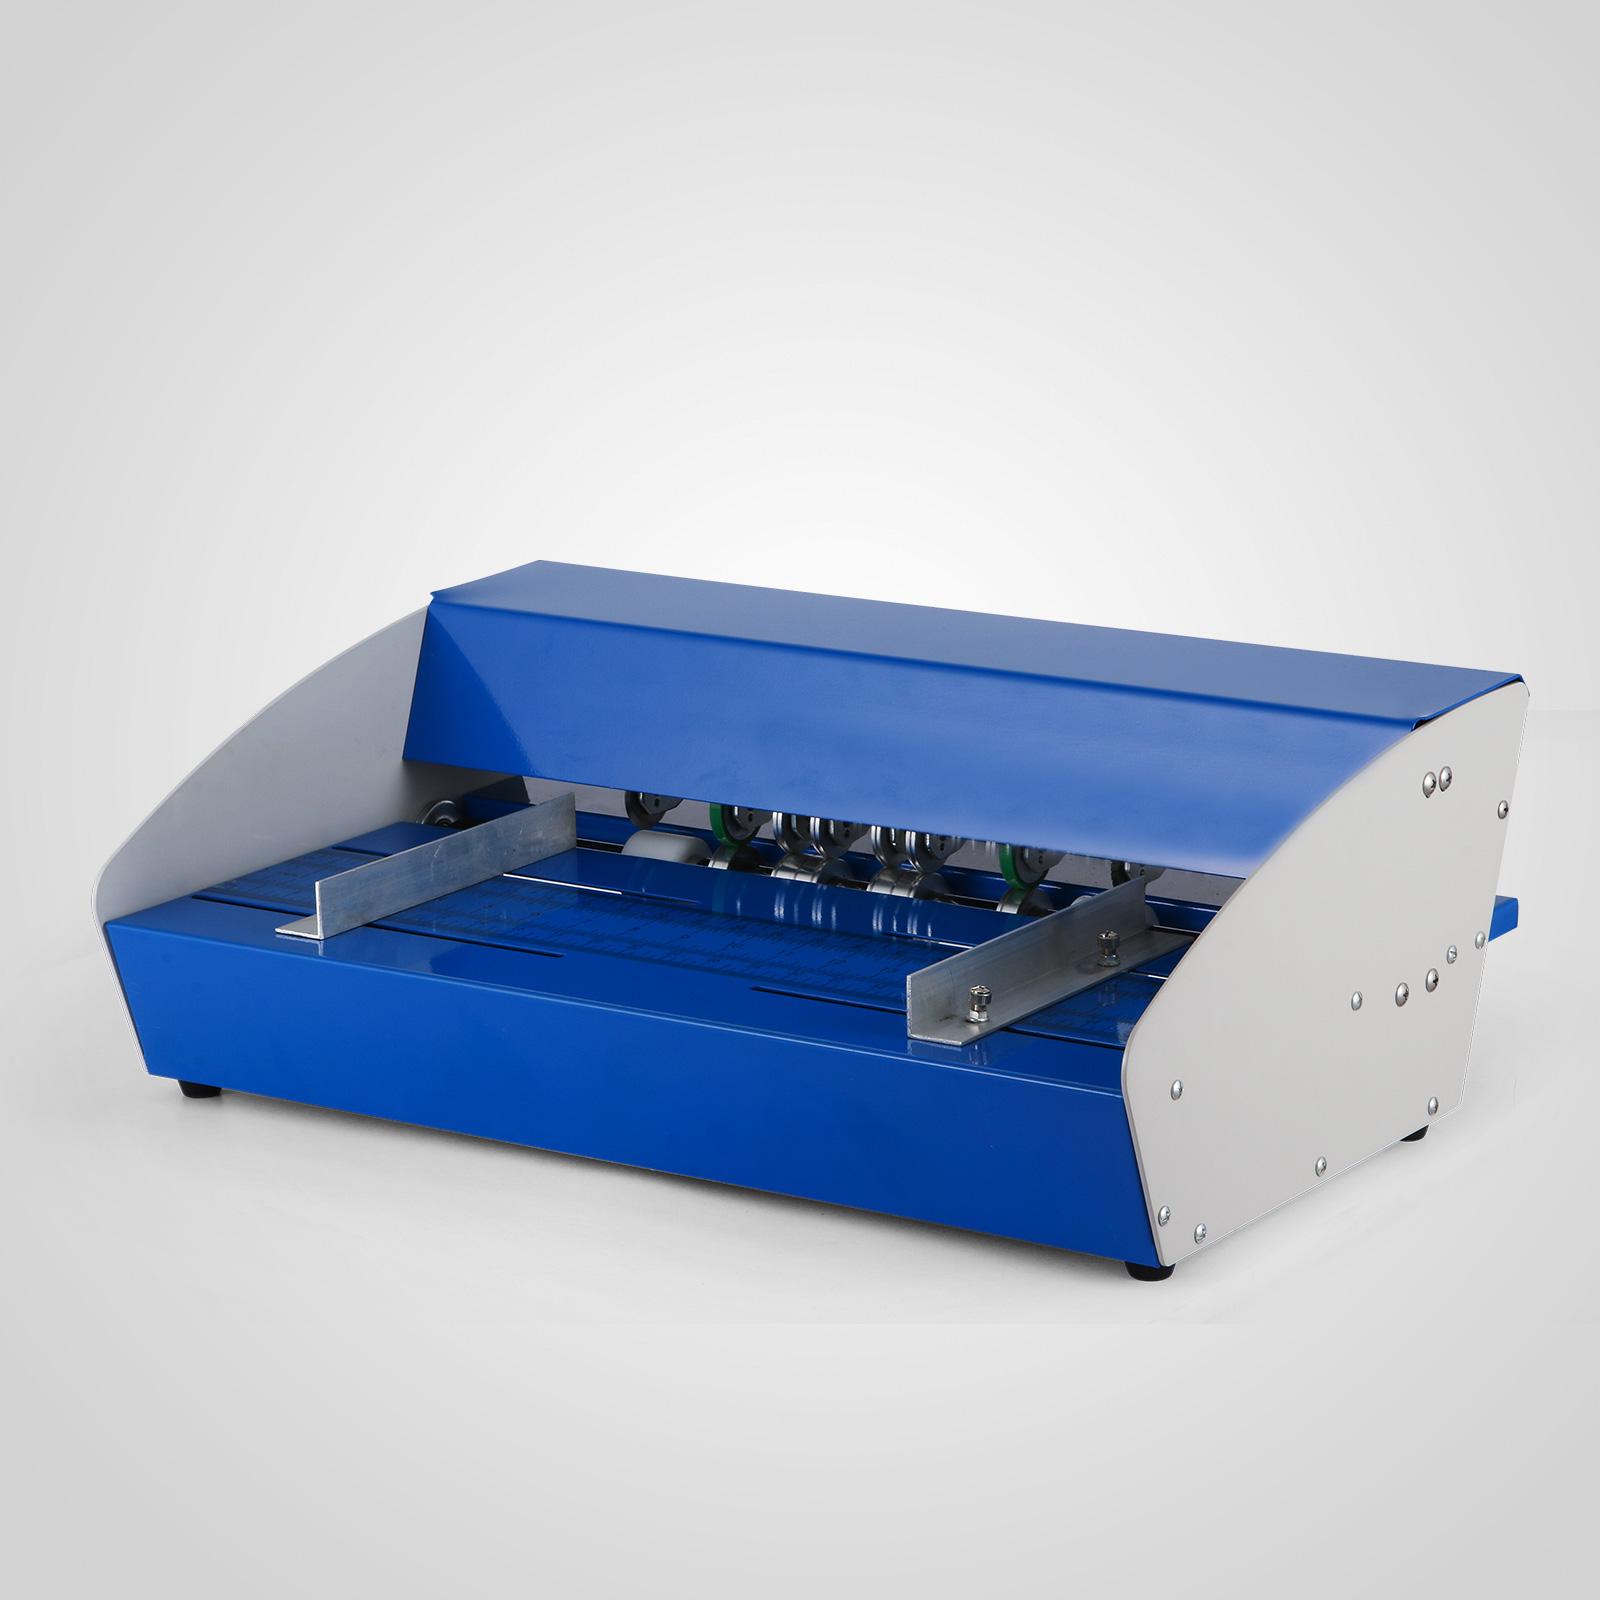 Cordonatrice-Perforatrice-Max-350-520mm-Profondita-Regolabile-Elettrica-Manuale miniatura 30